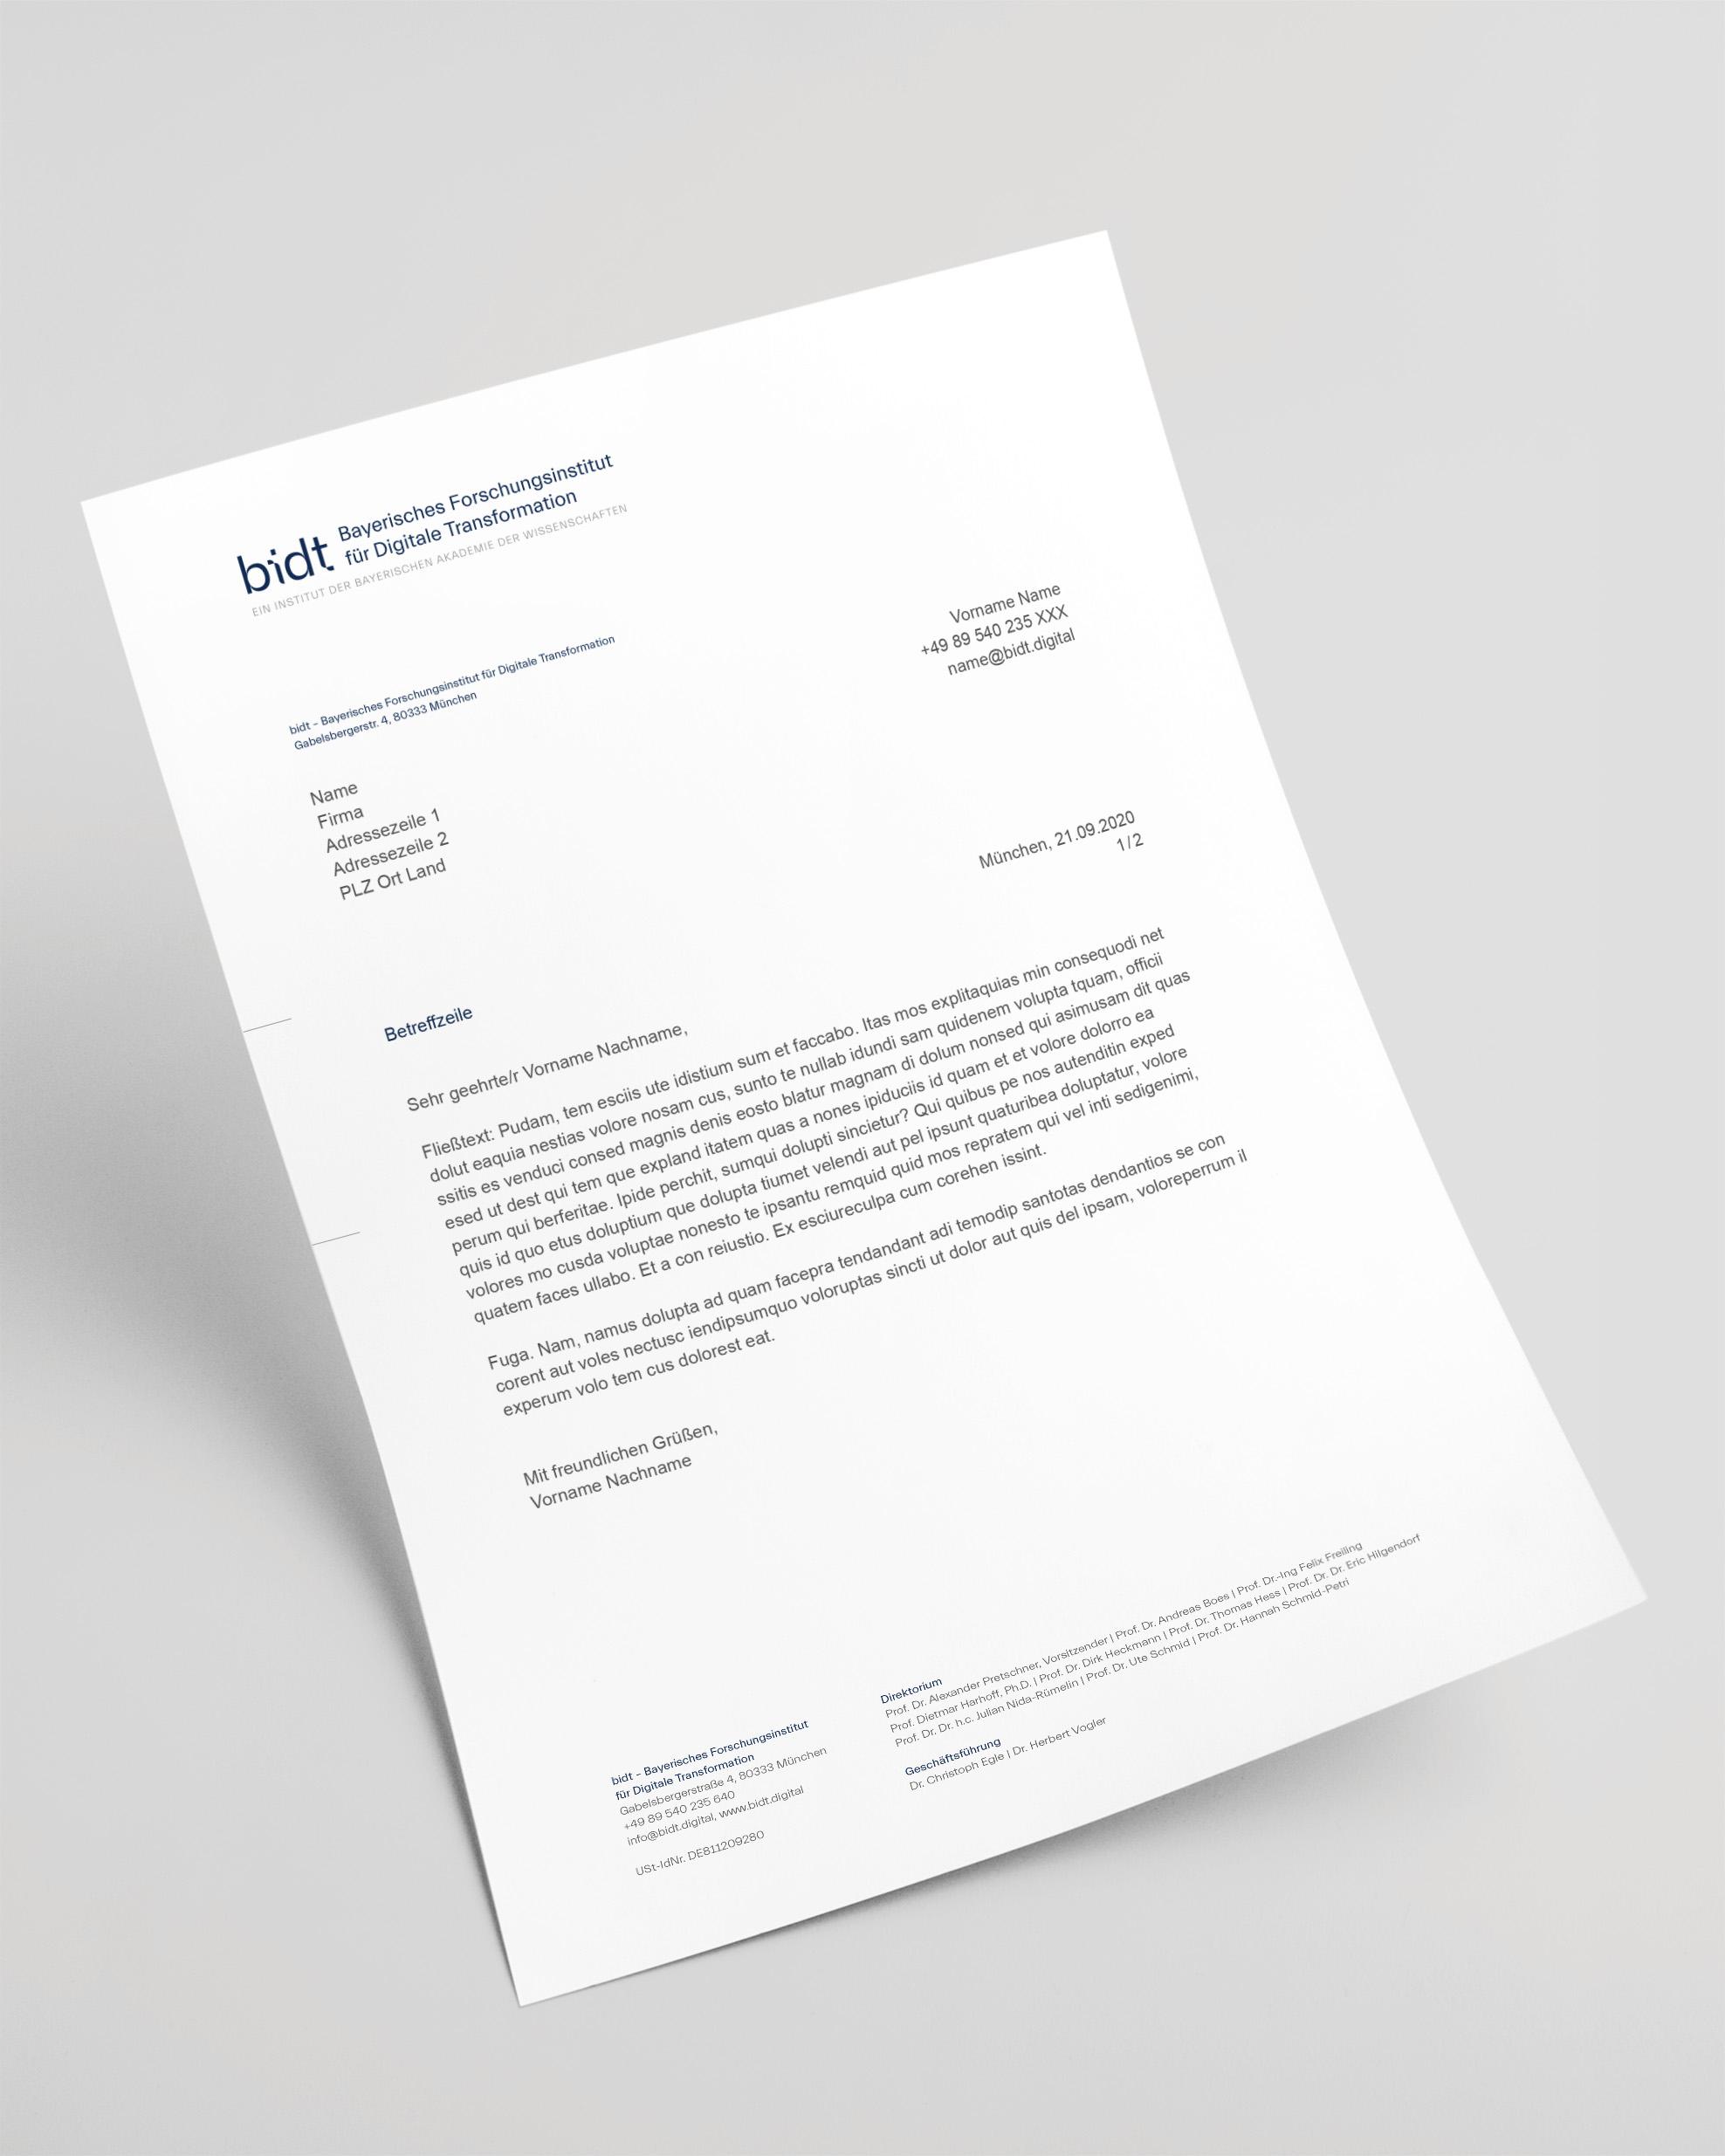 bidt-Briefpapier-Mockup-20210218-lw-c